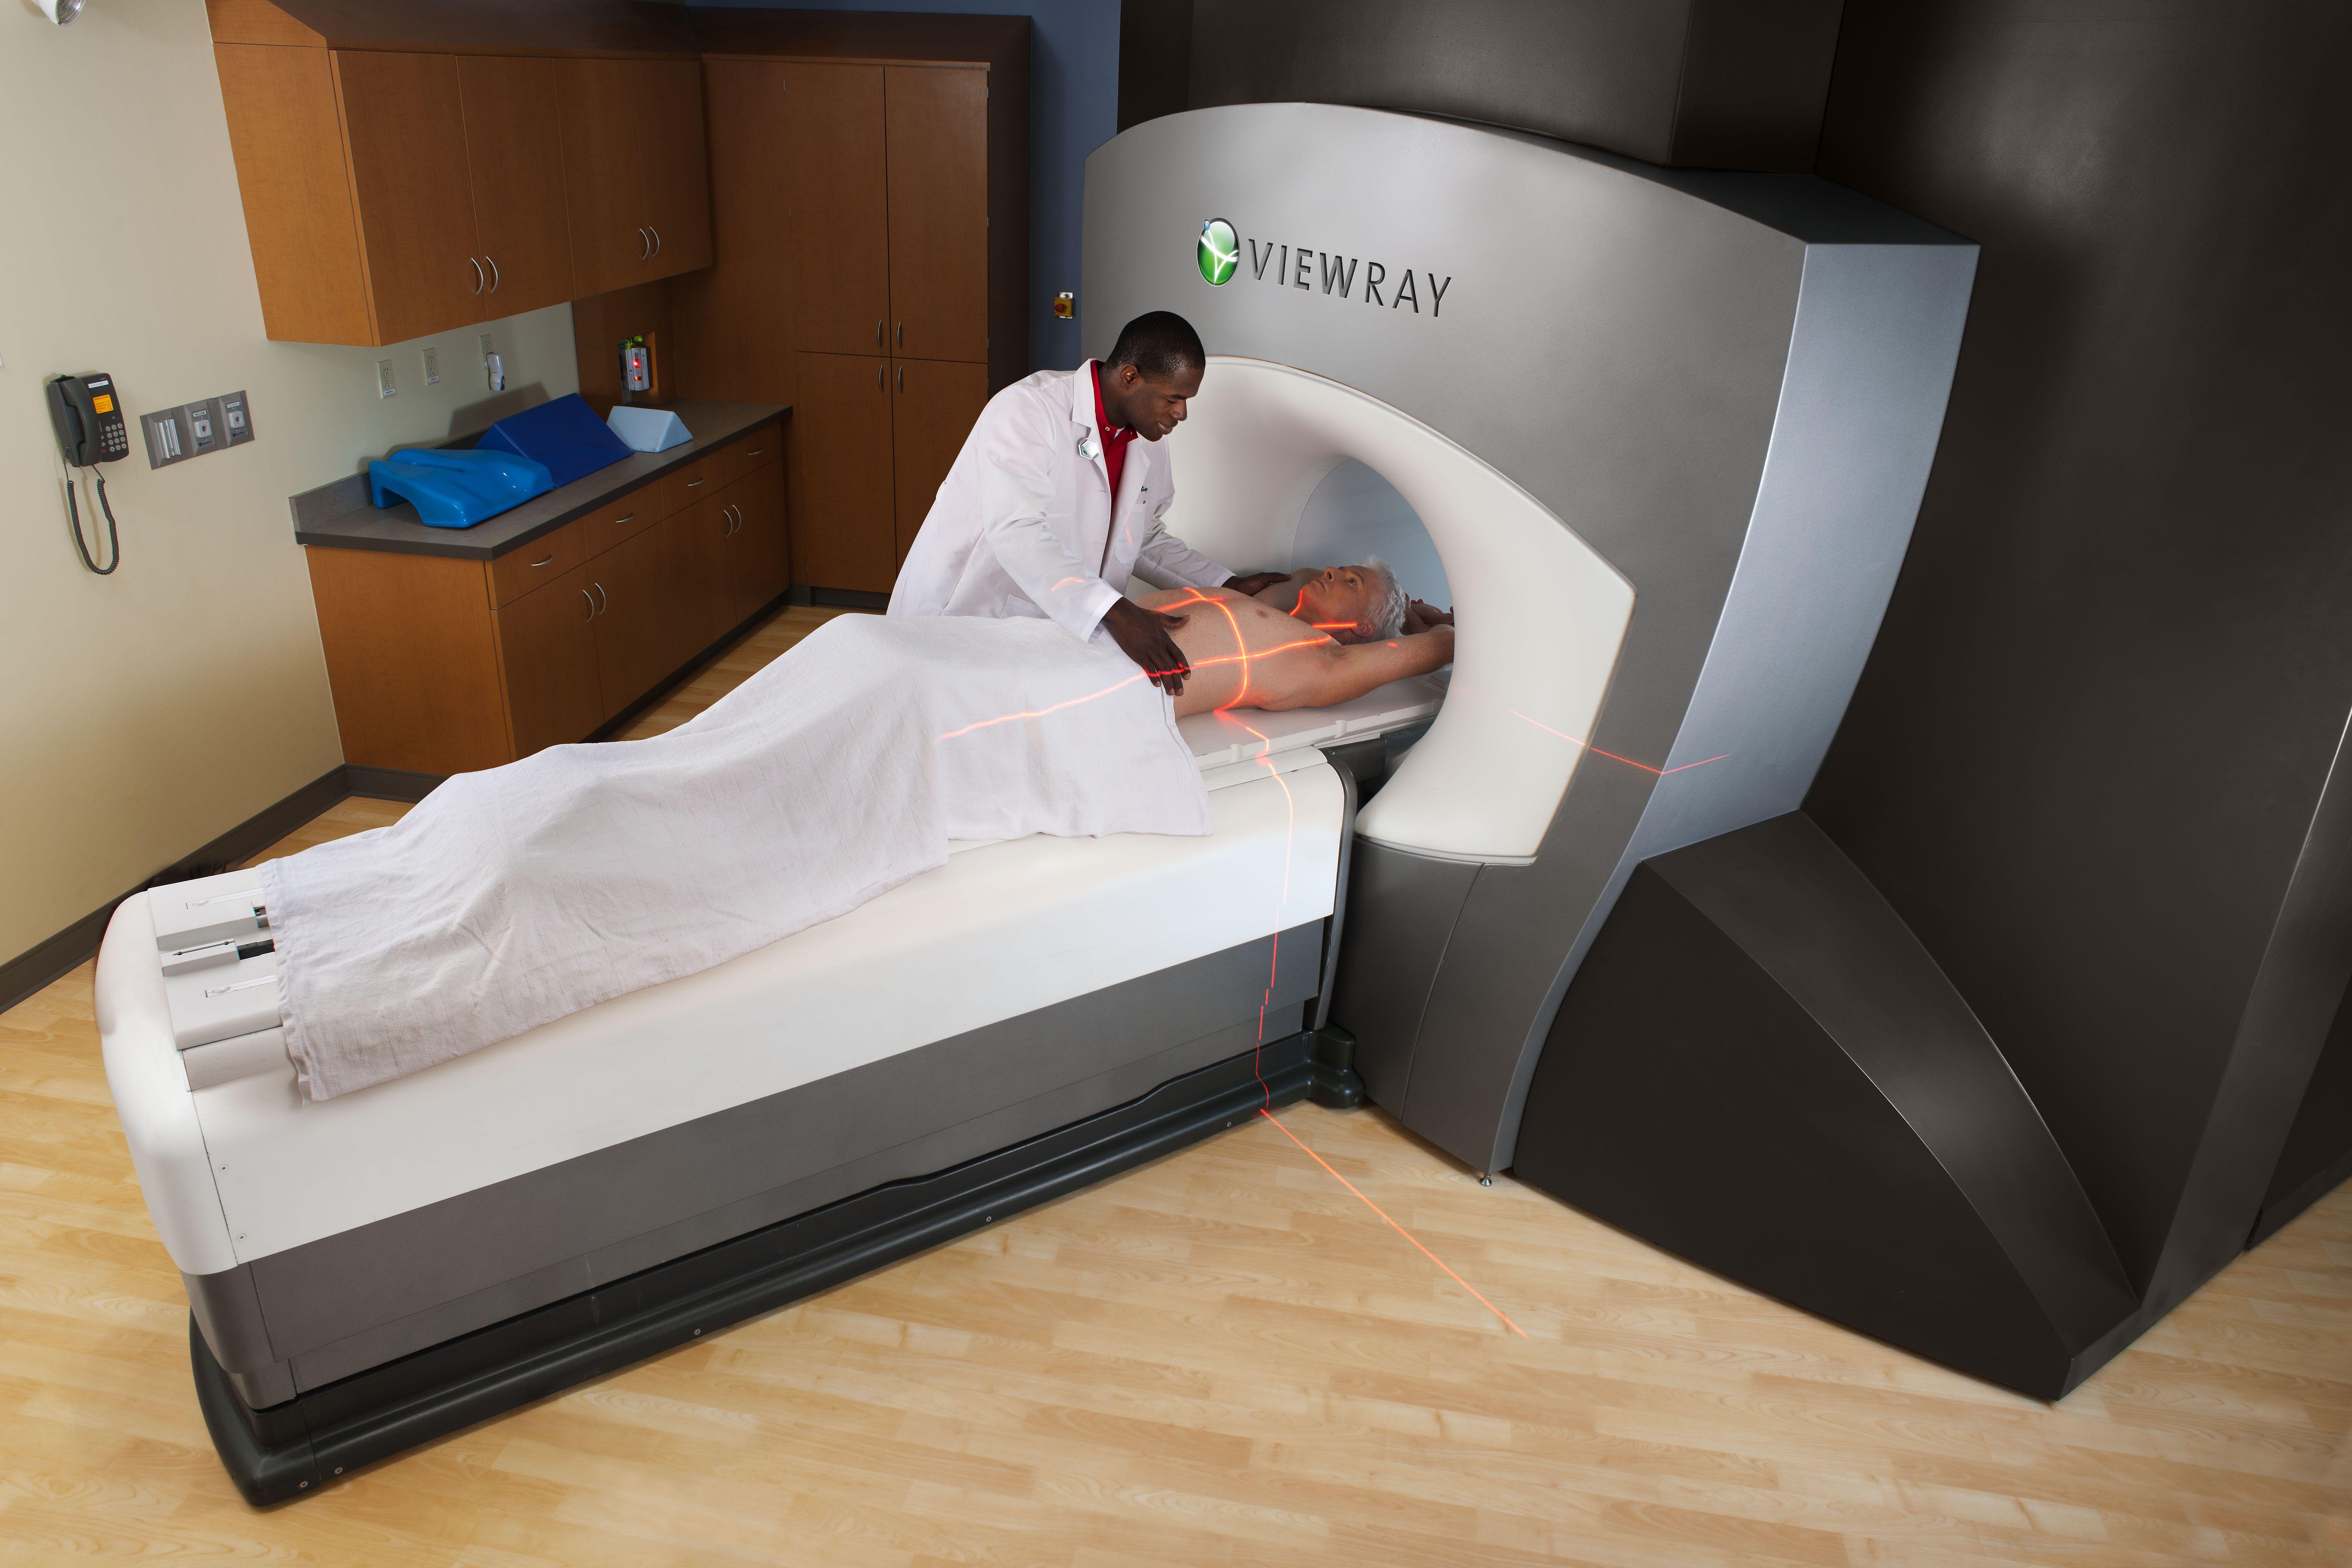 Viewray Mri Guided Radiation Therapy Technology